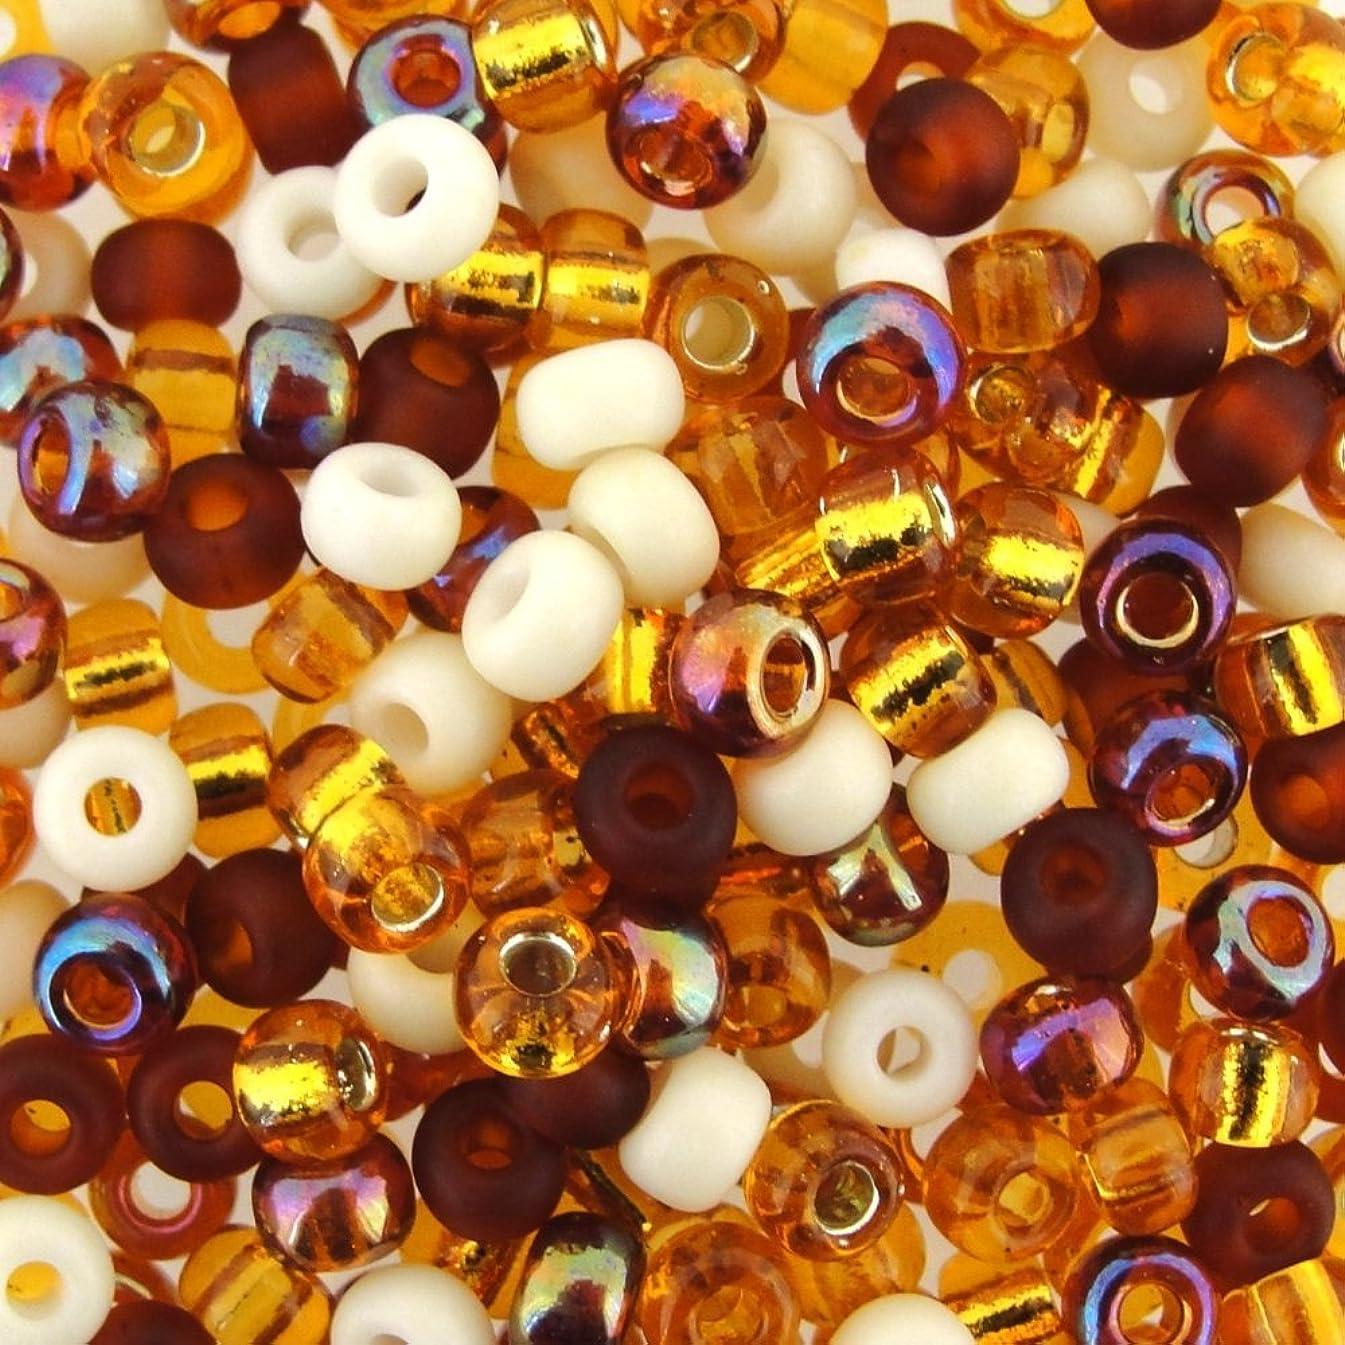 Miyuki Round Seed Beads Size 6/0 20g Honey Butter Mix oixzkvmsm7106163